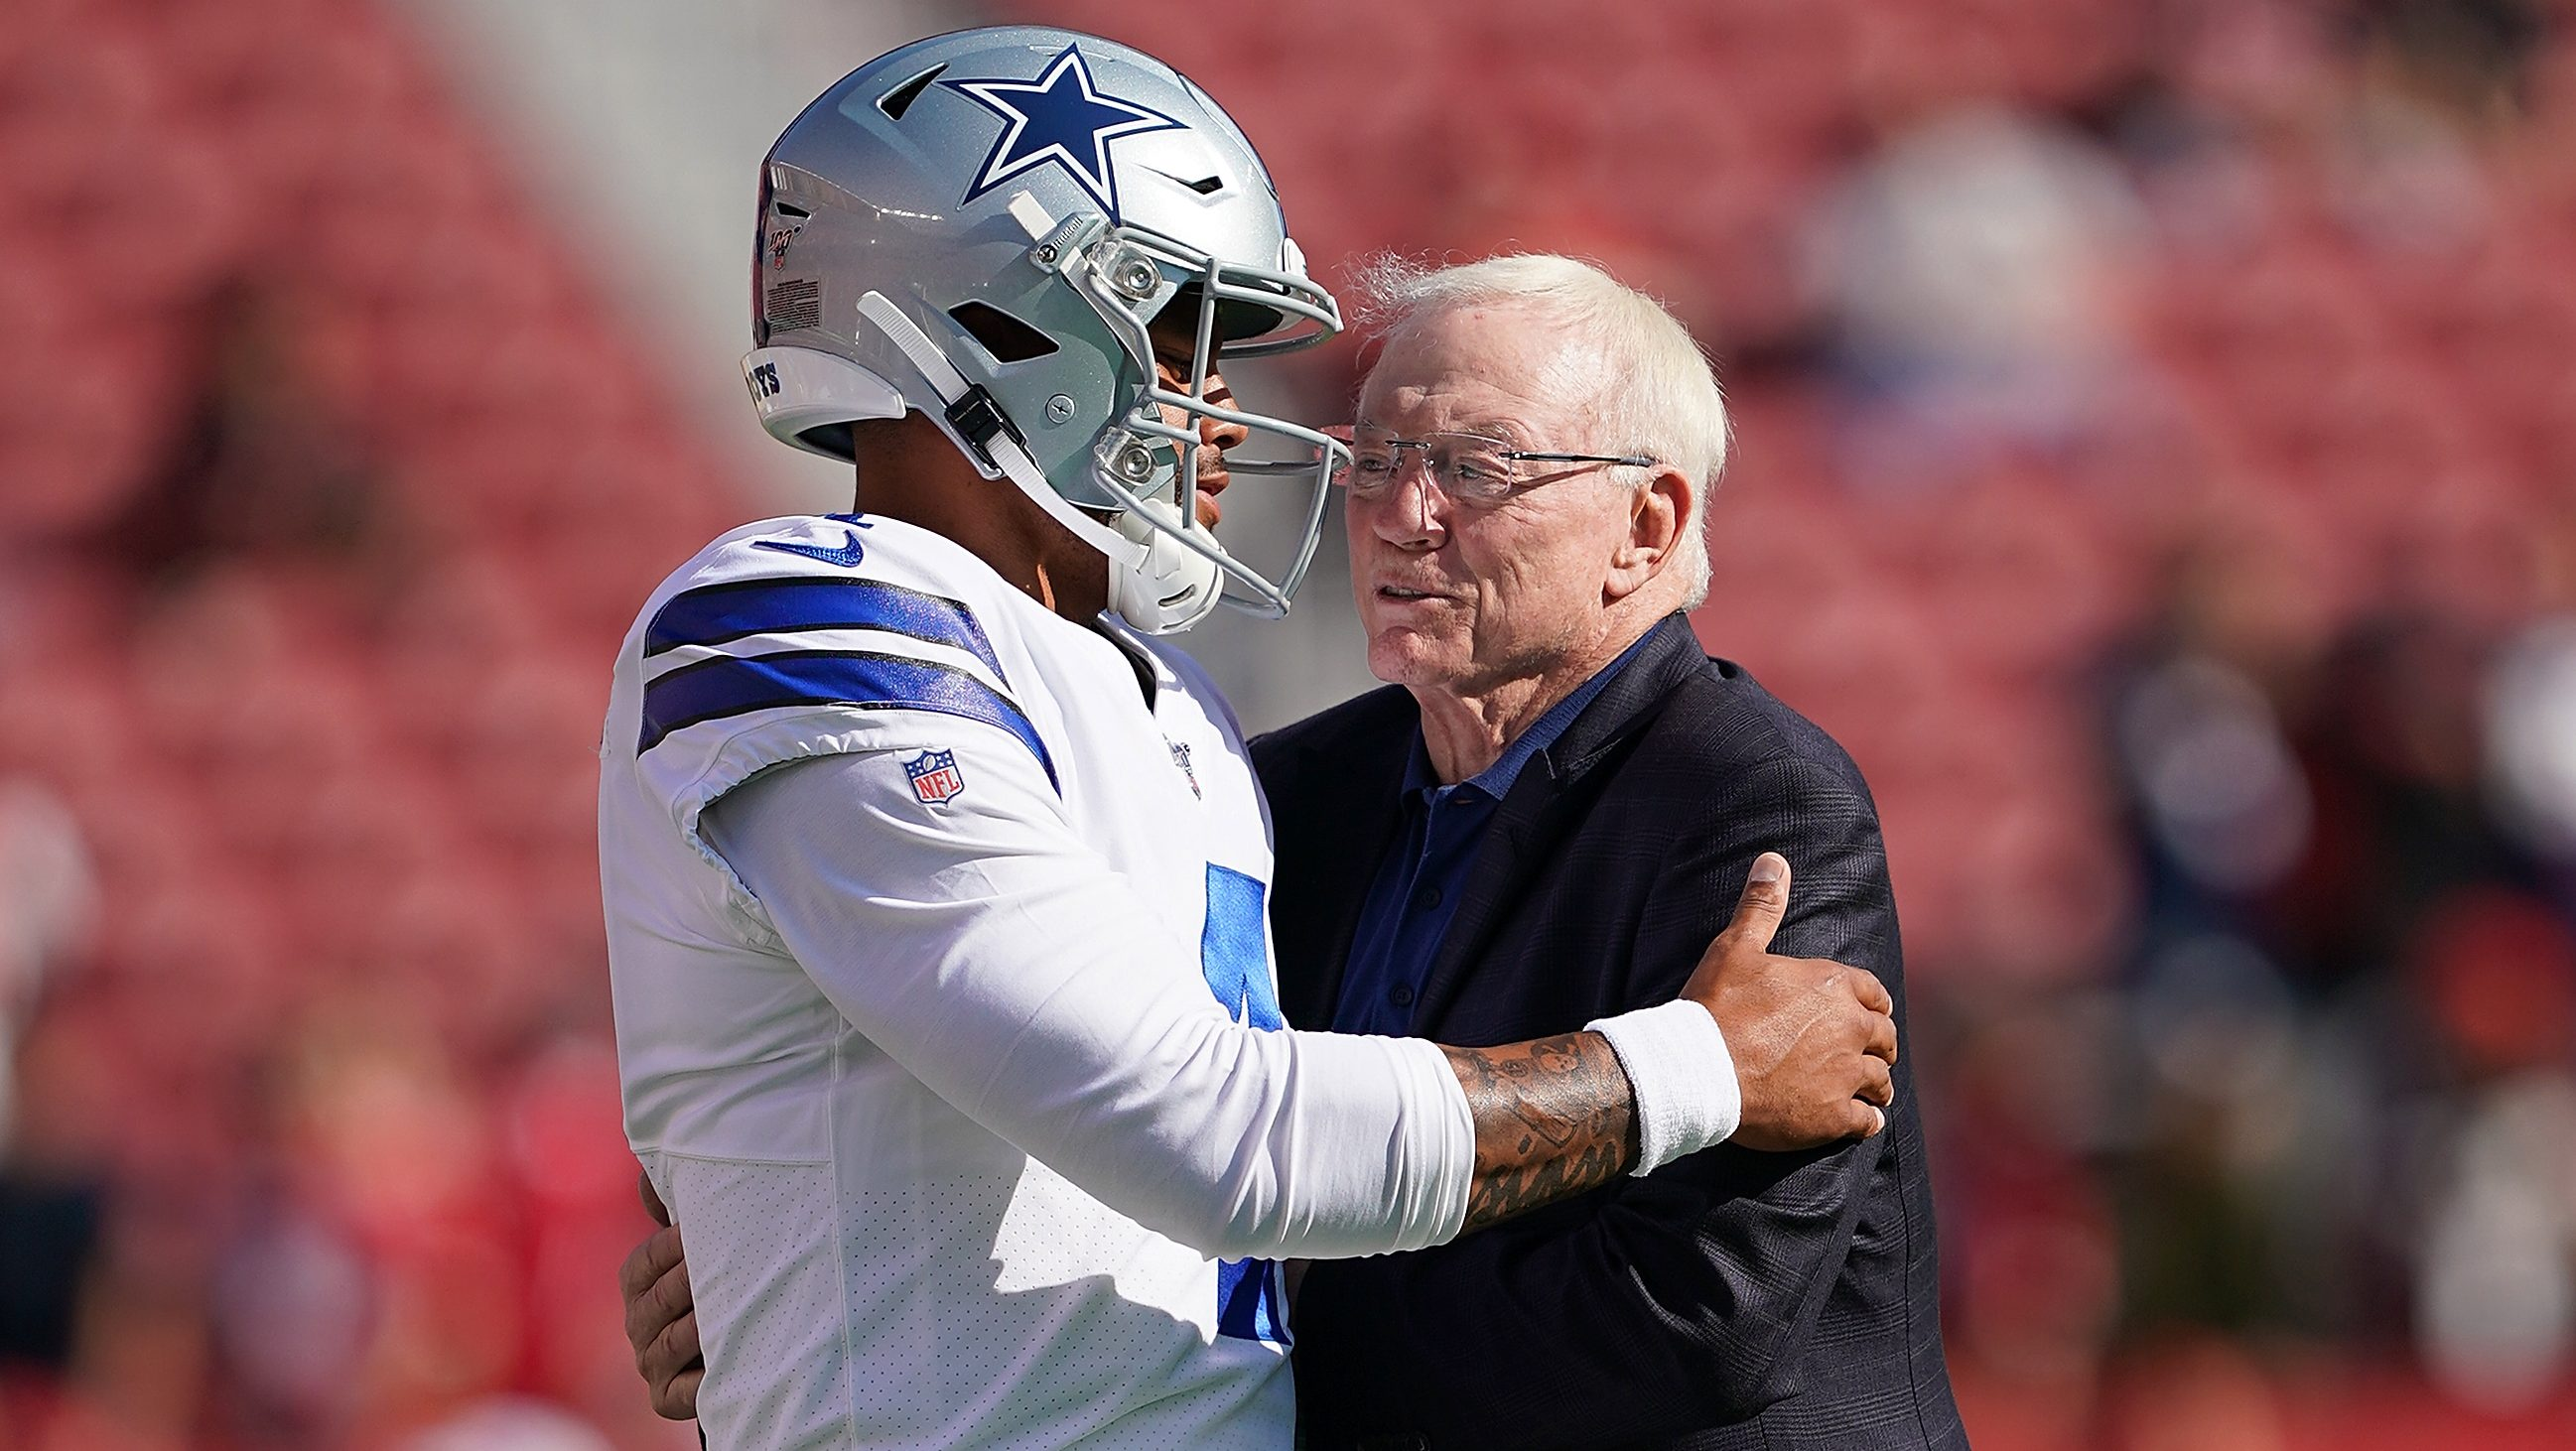 Dak Prescott's Brother Tad Pushed Stephon Gilmore to Cowboys Rumors - Heavy.com